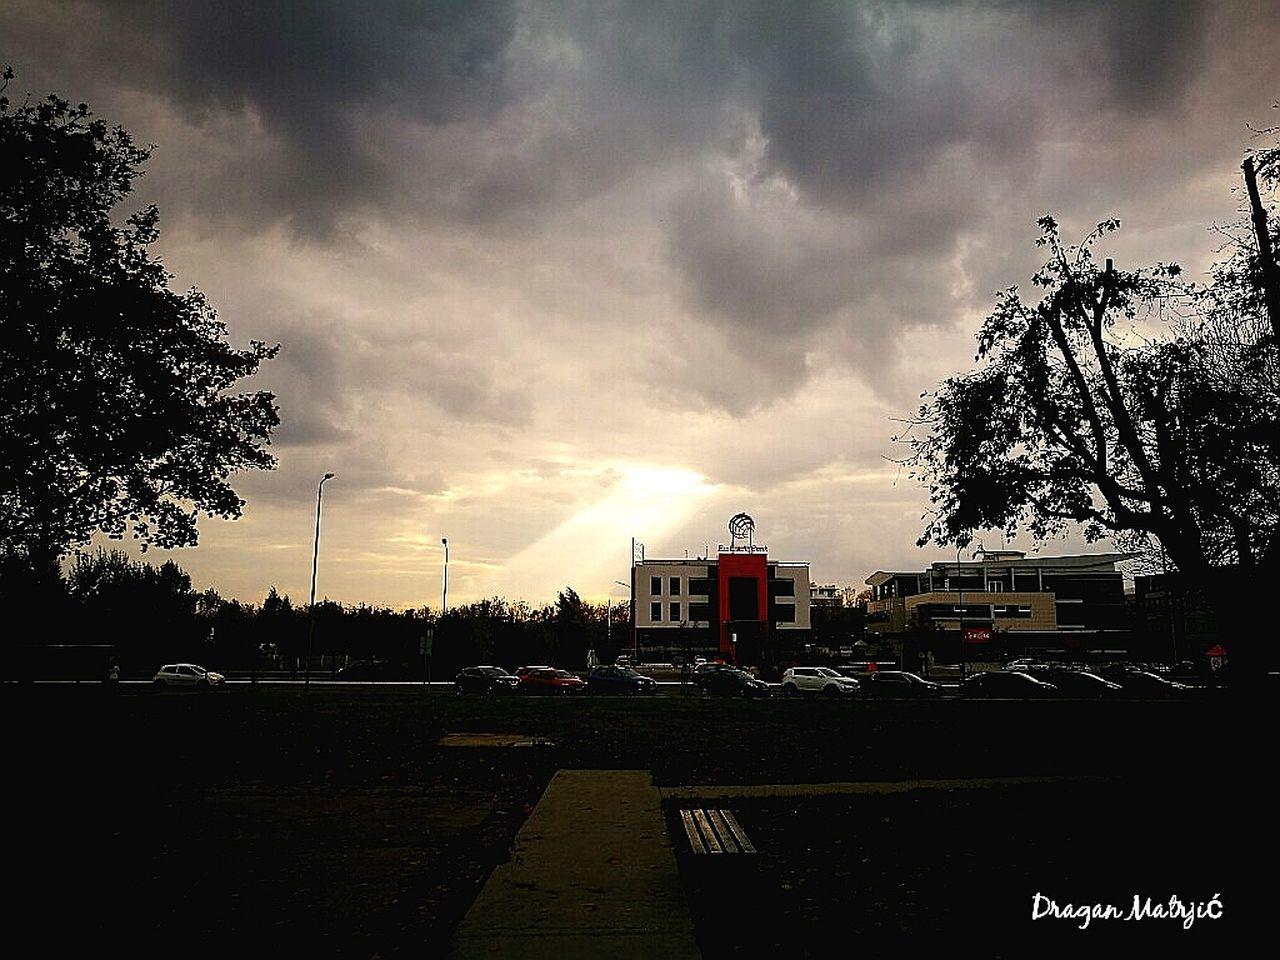 sky, cloud - sky, tree, built structure, building exterior, architecture, car, city, sunset, no people, storm cloud, outdoors, nature, day, cityscape